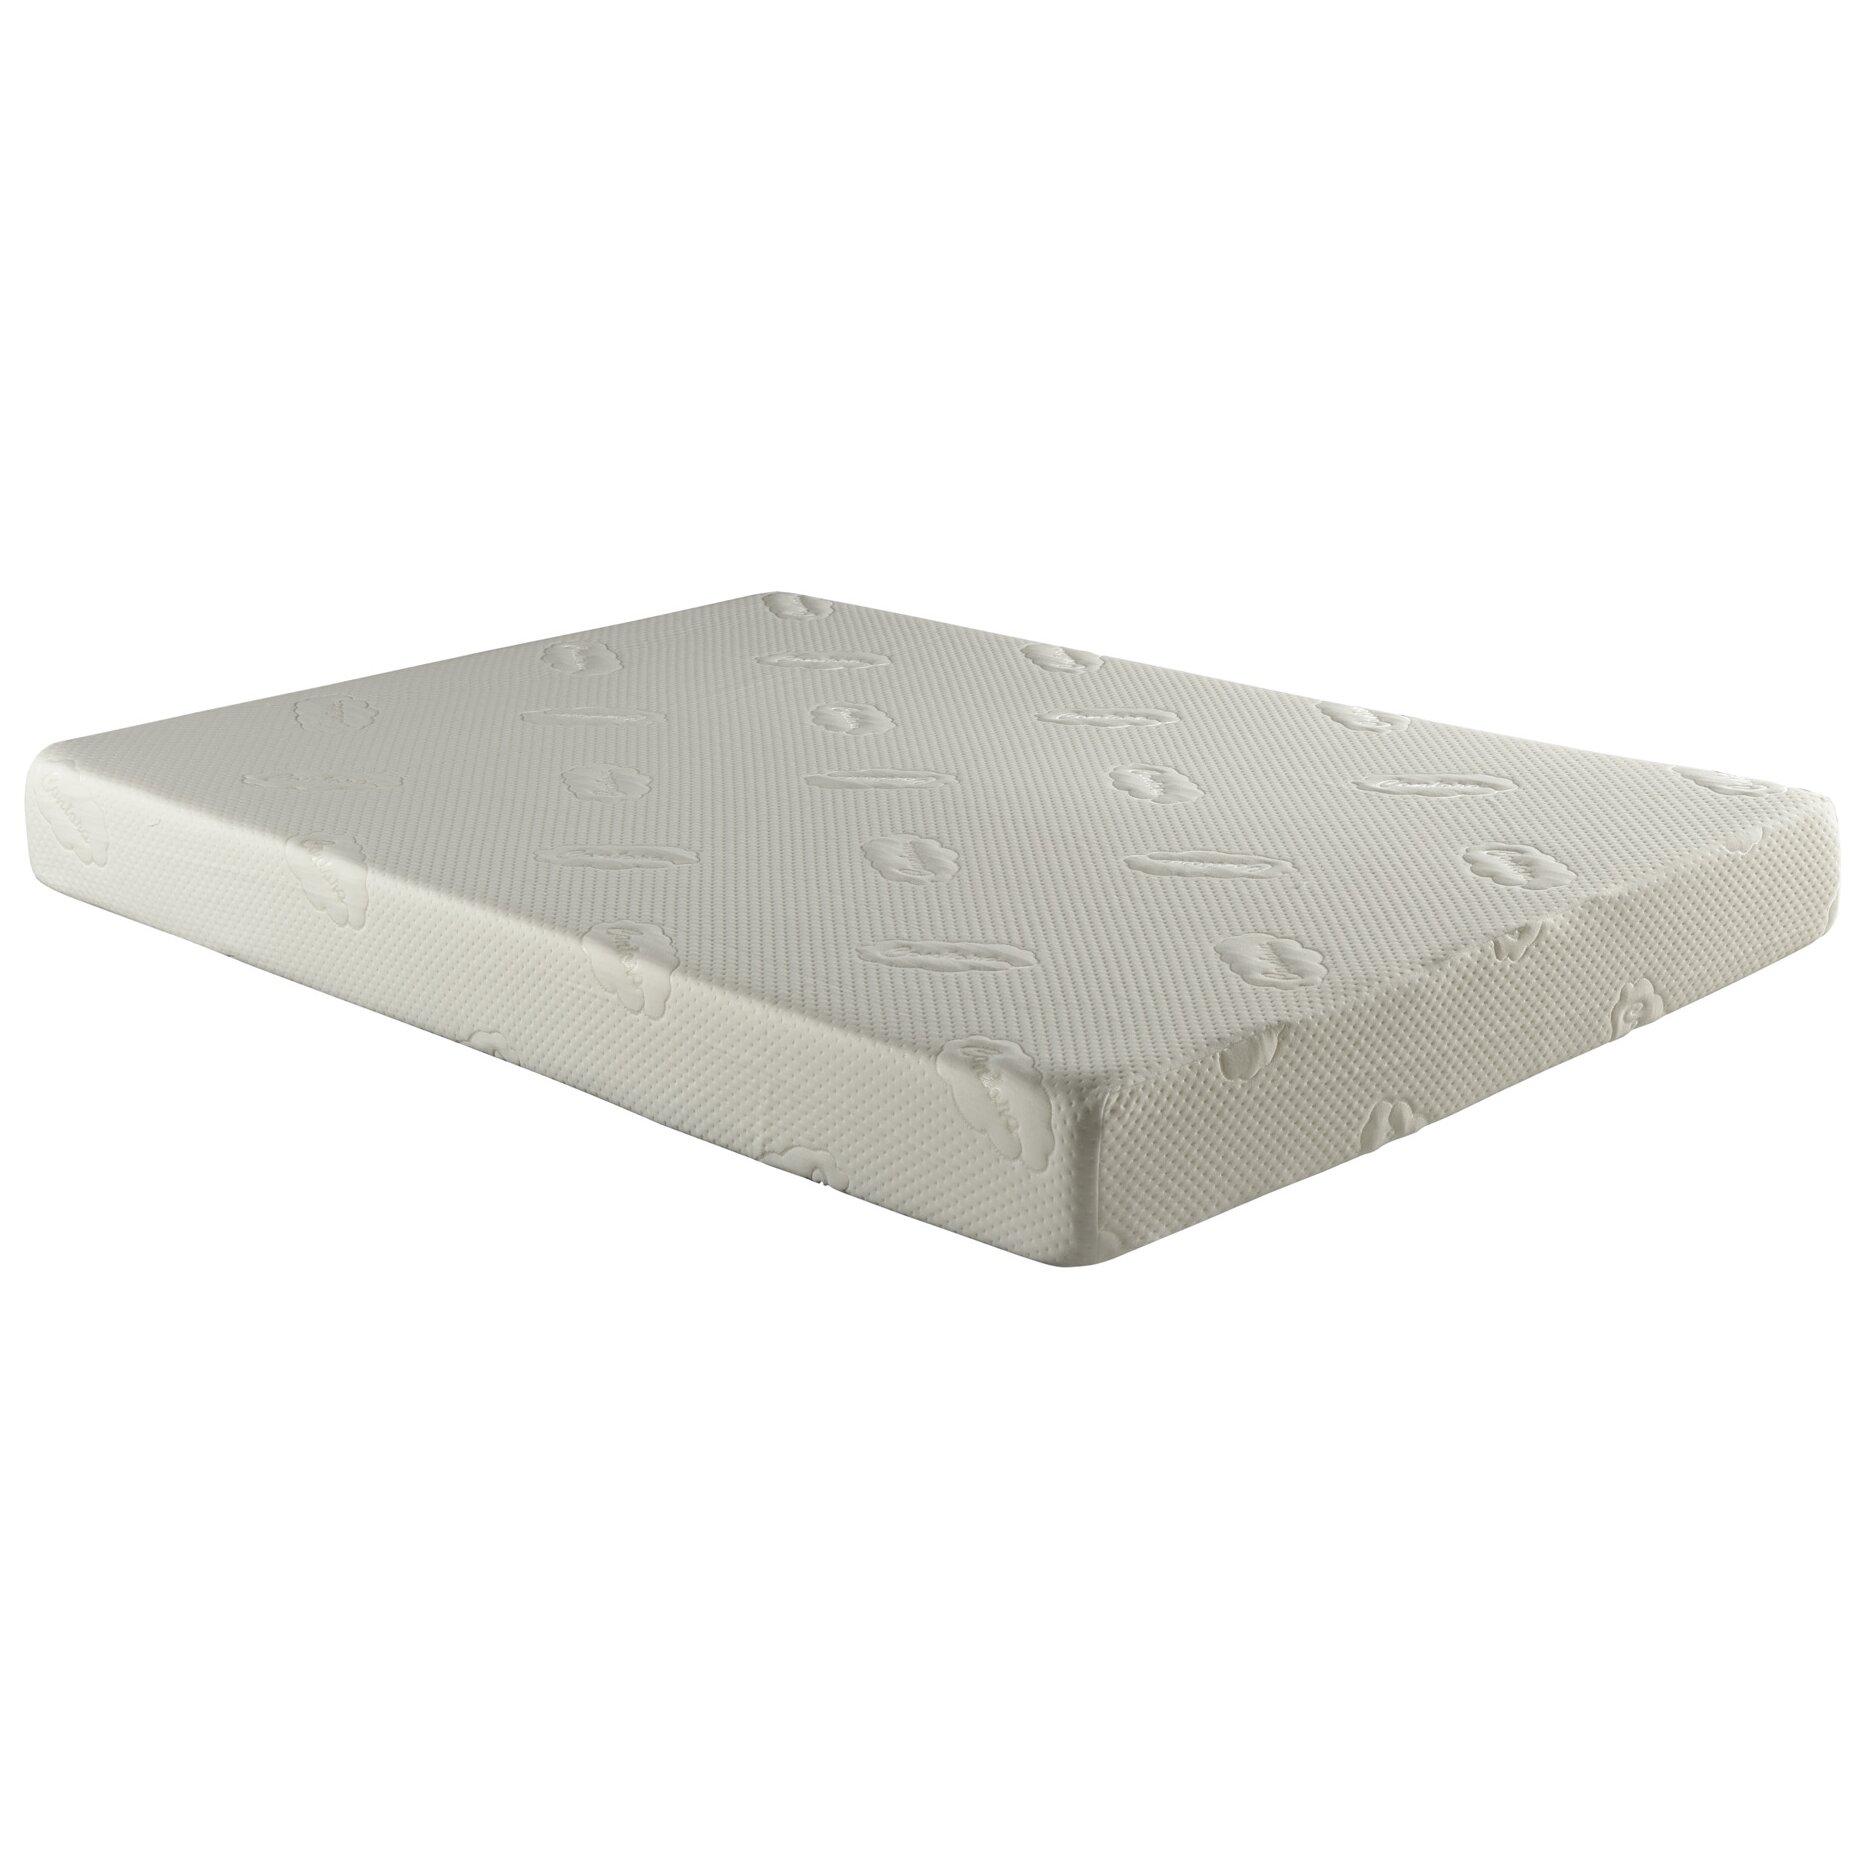 Atlantic Furniture Contora Easy Rest Memory Foam Mattress Reviews Wayfair